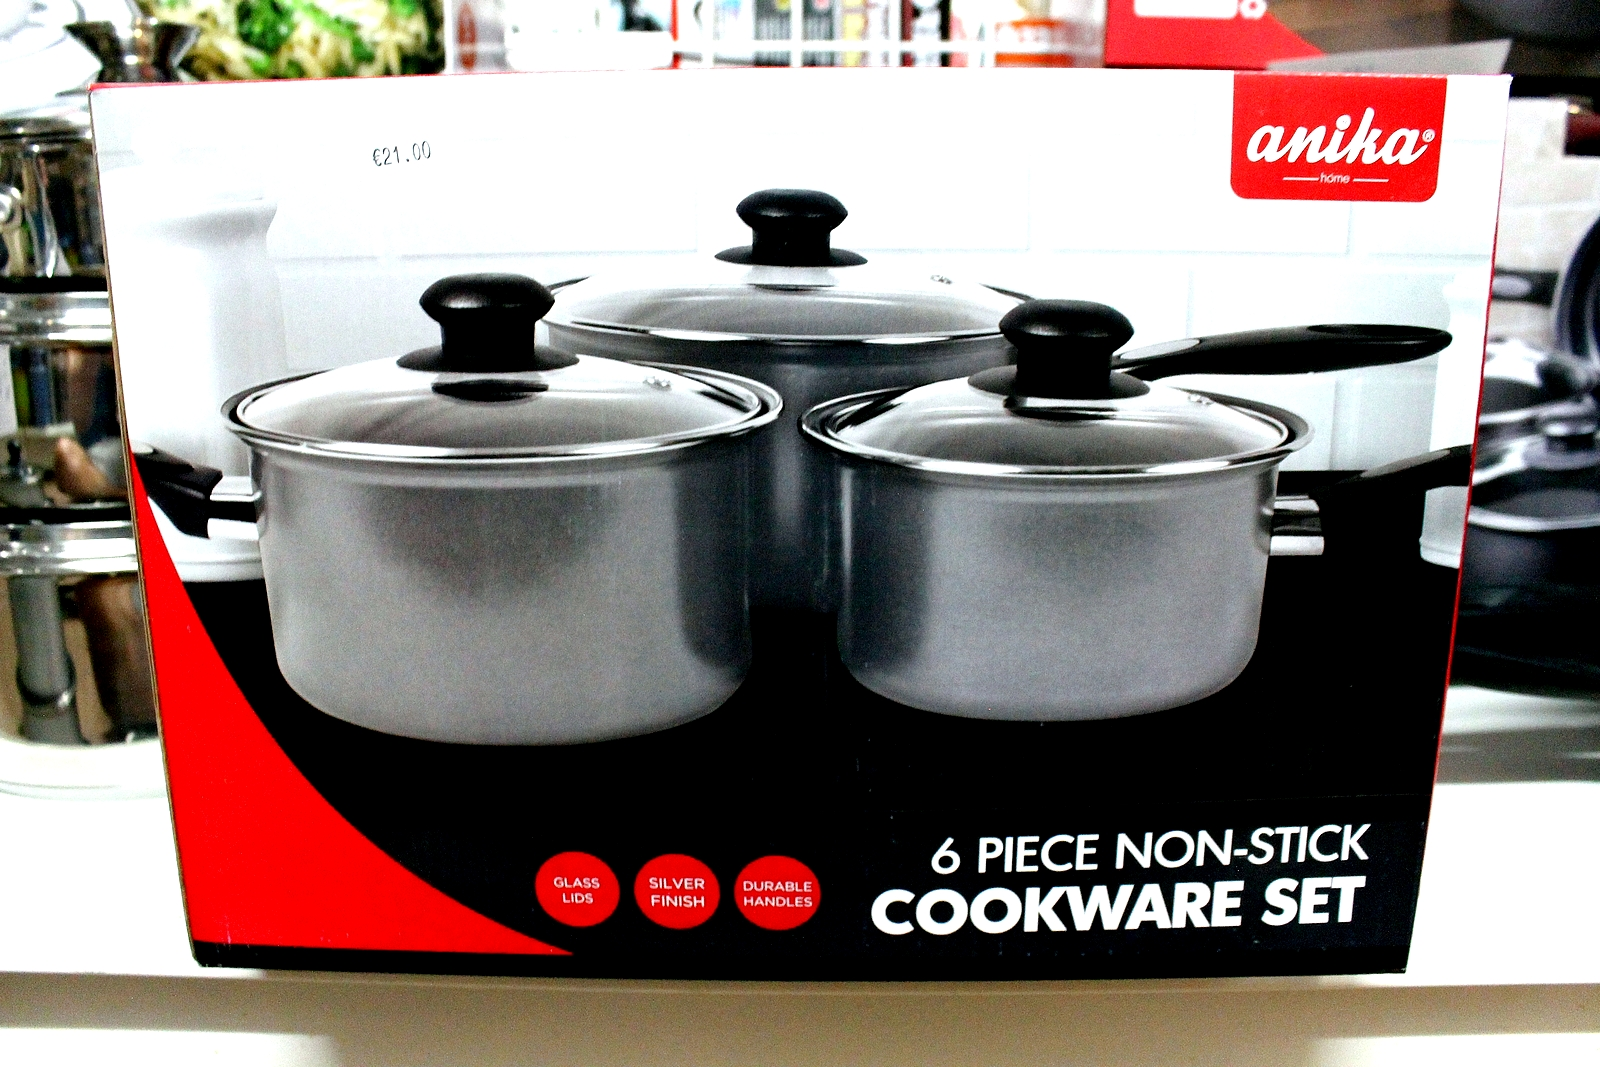 Saucepans/frying pans for sale, Torrevieja, Spain